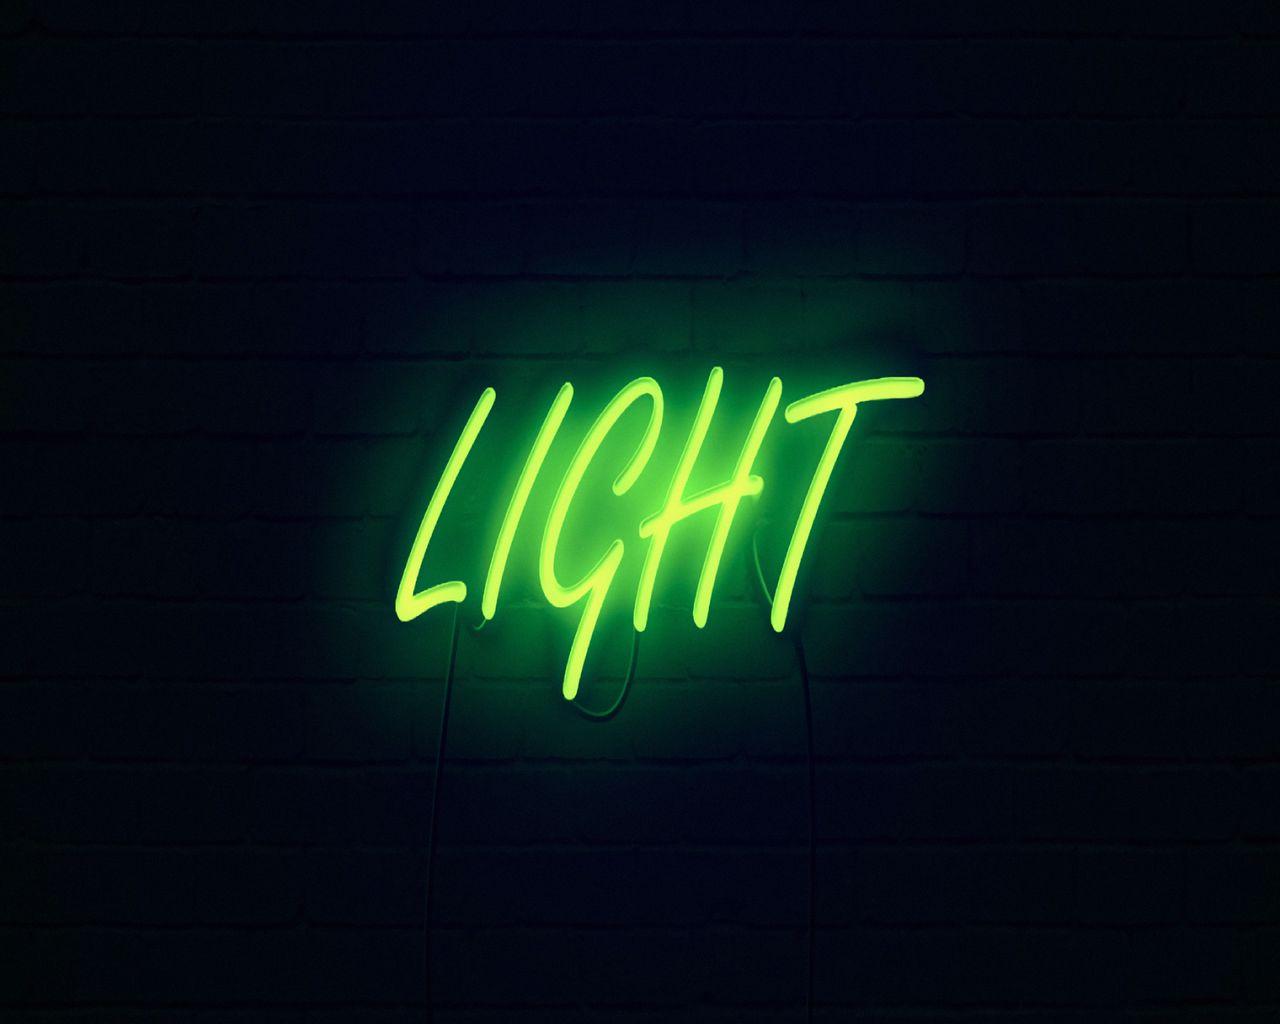 1280x1024 Wallpaper light, neon, inscription, dark, yellow